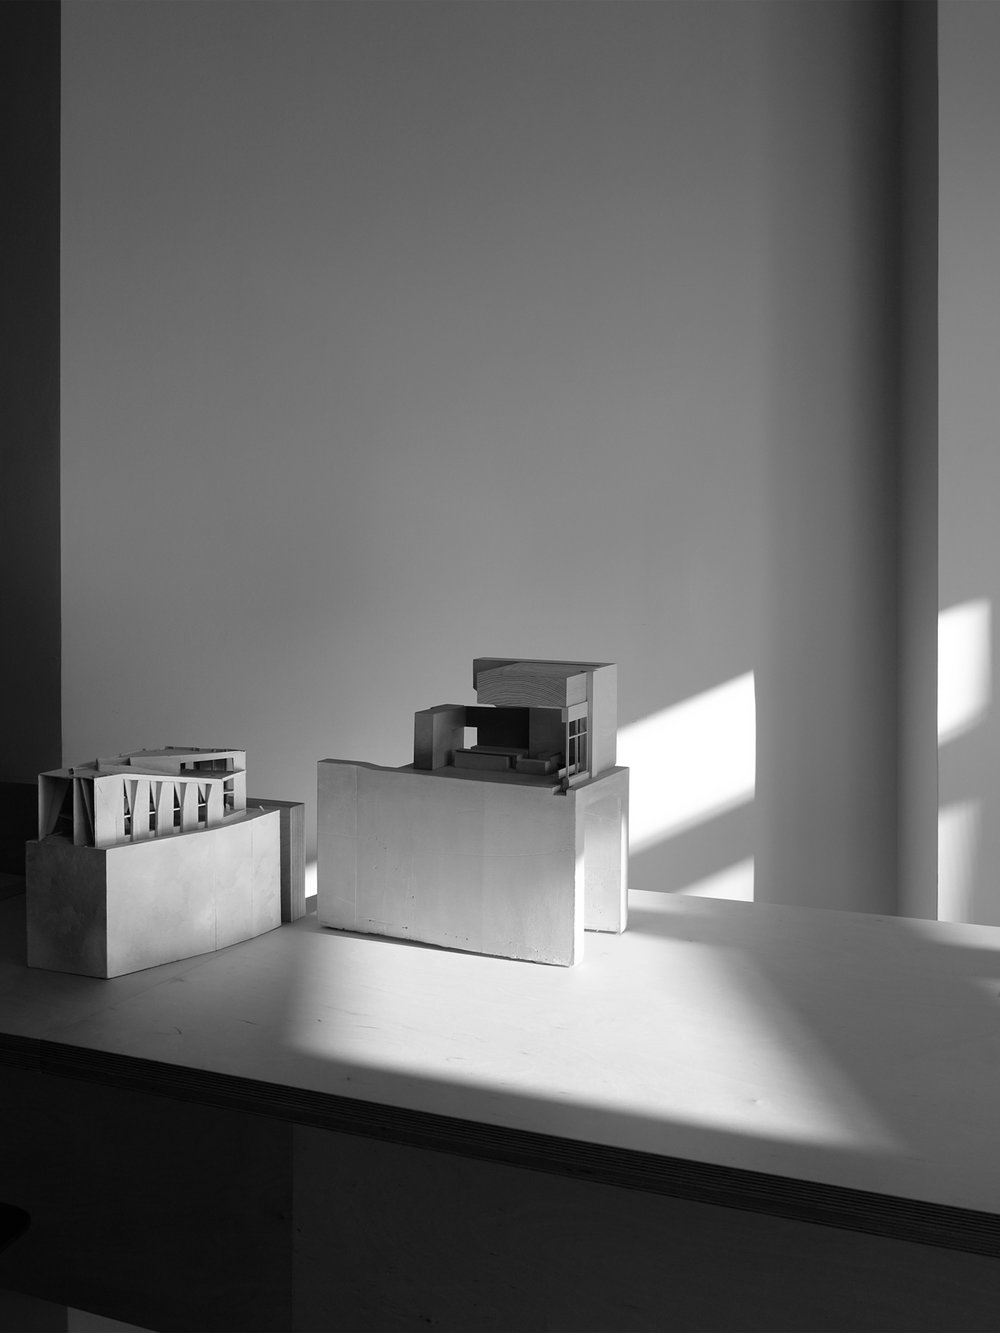 FSOARK office models 1875x2500 BW.jpg